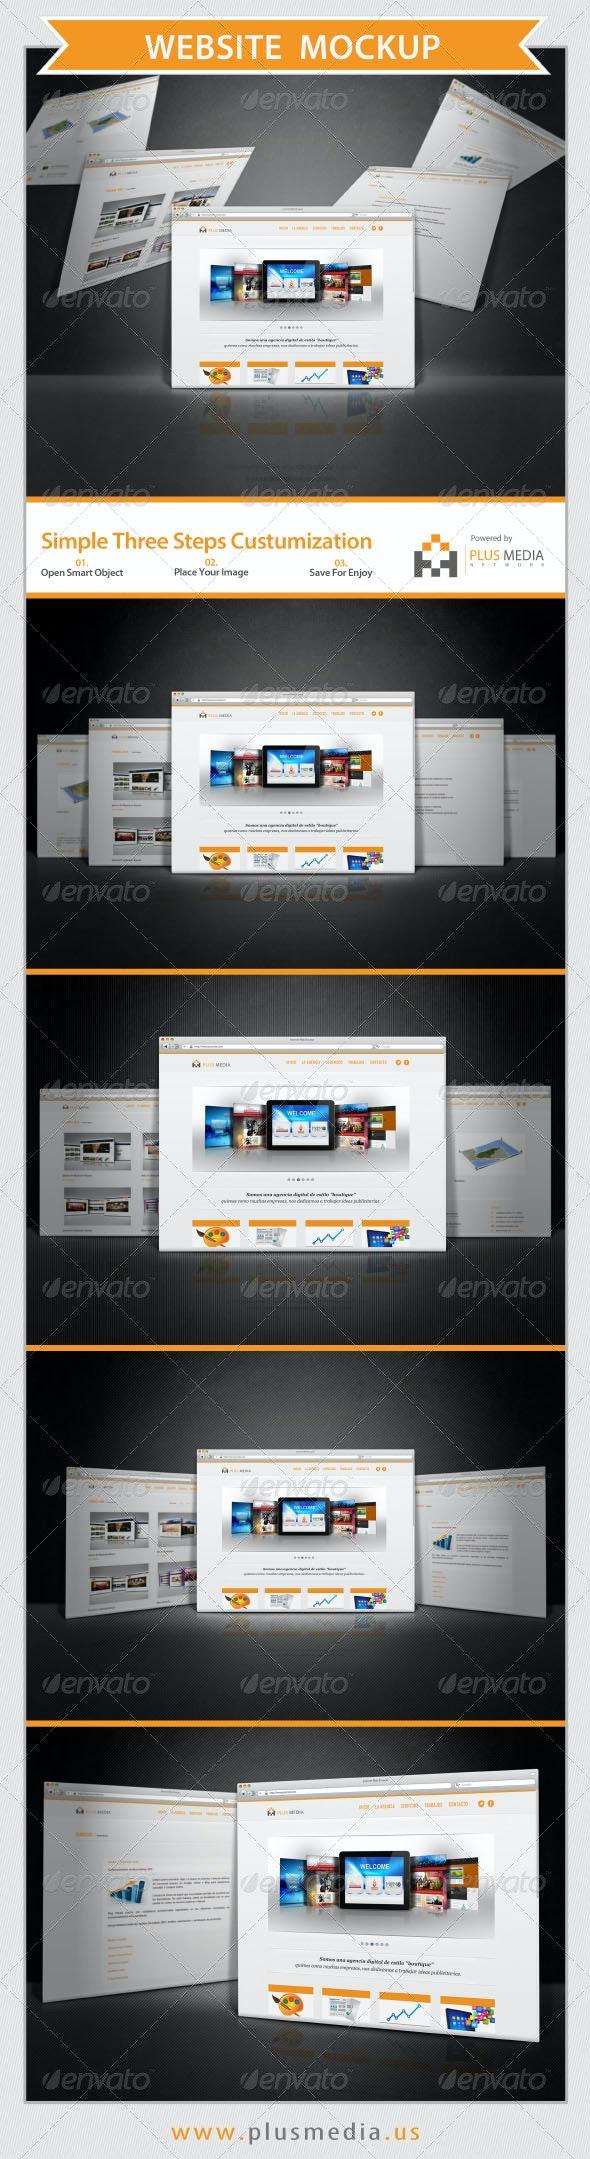 Website Mockup - Product Mock-Ups Graphics